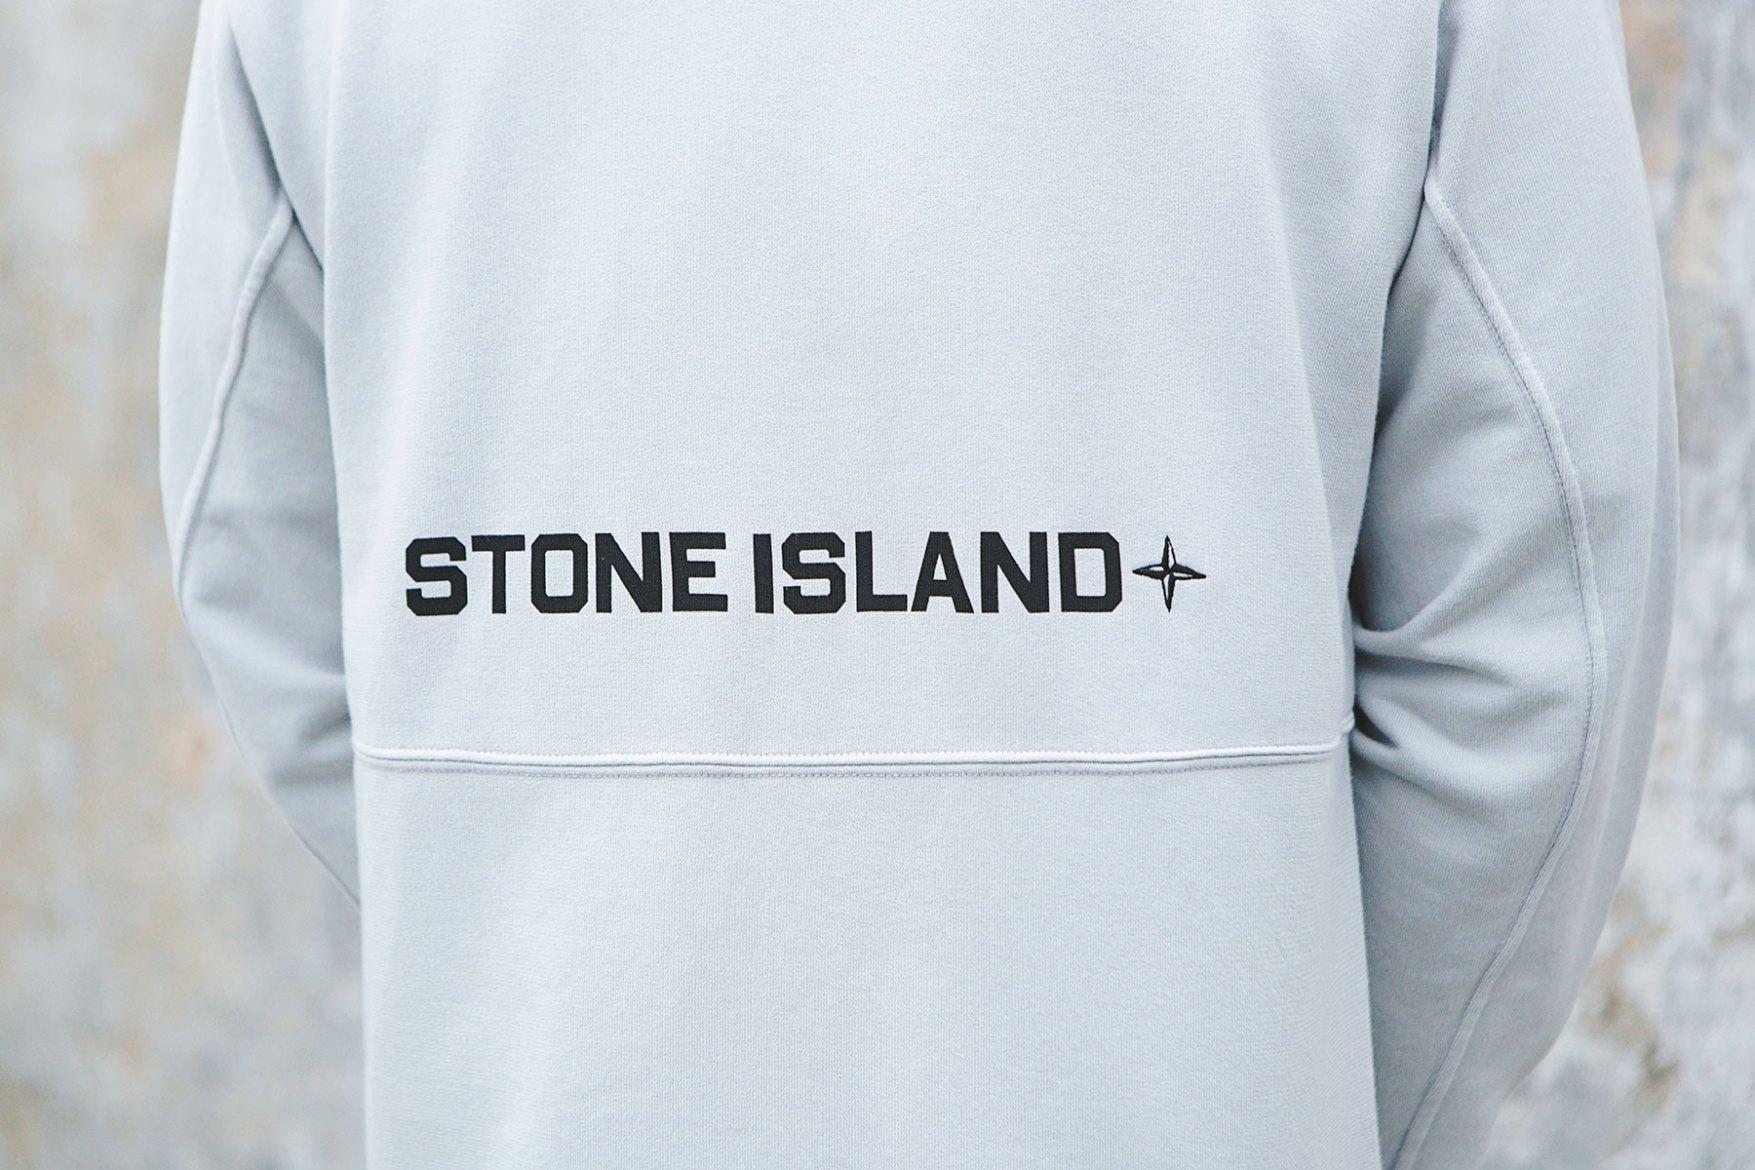 Stone Island 2016 Spring/Summer Lookbook Video